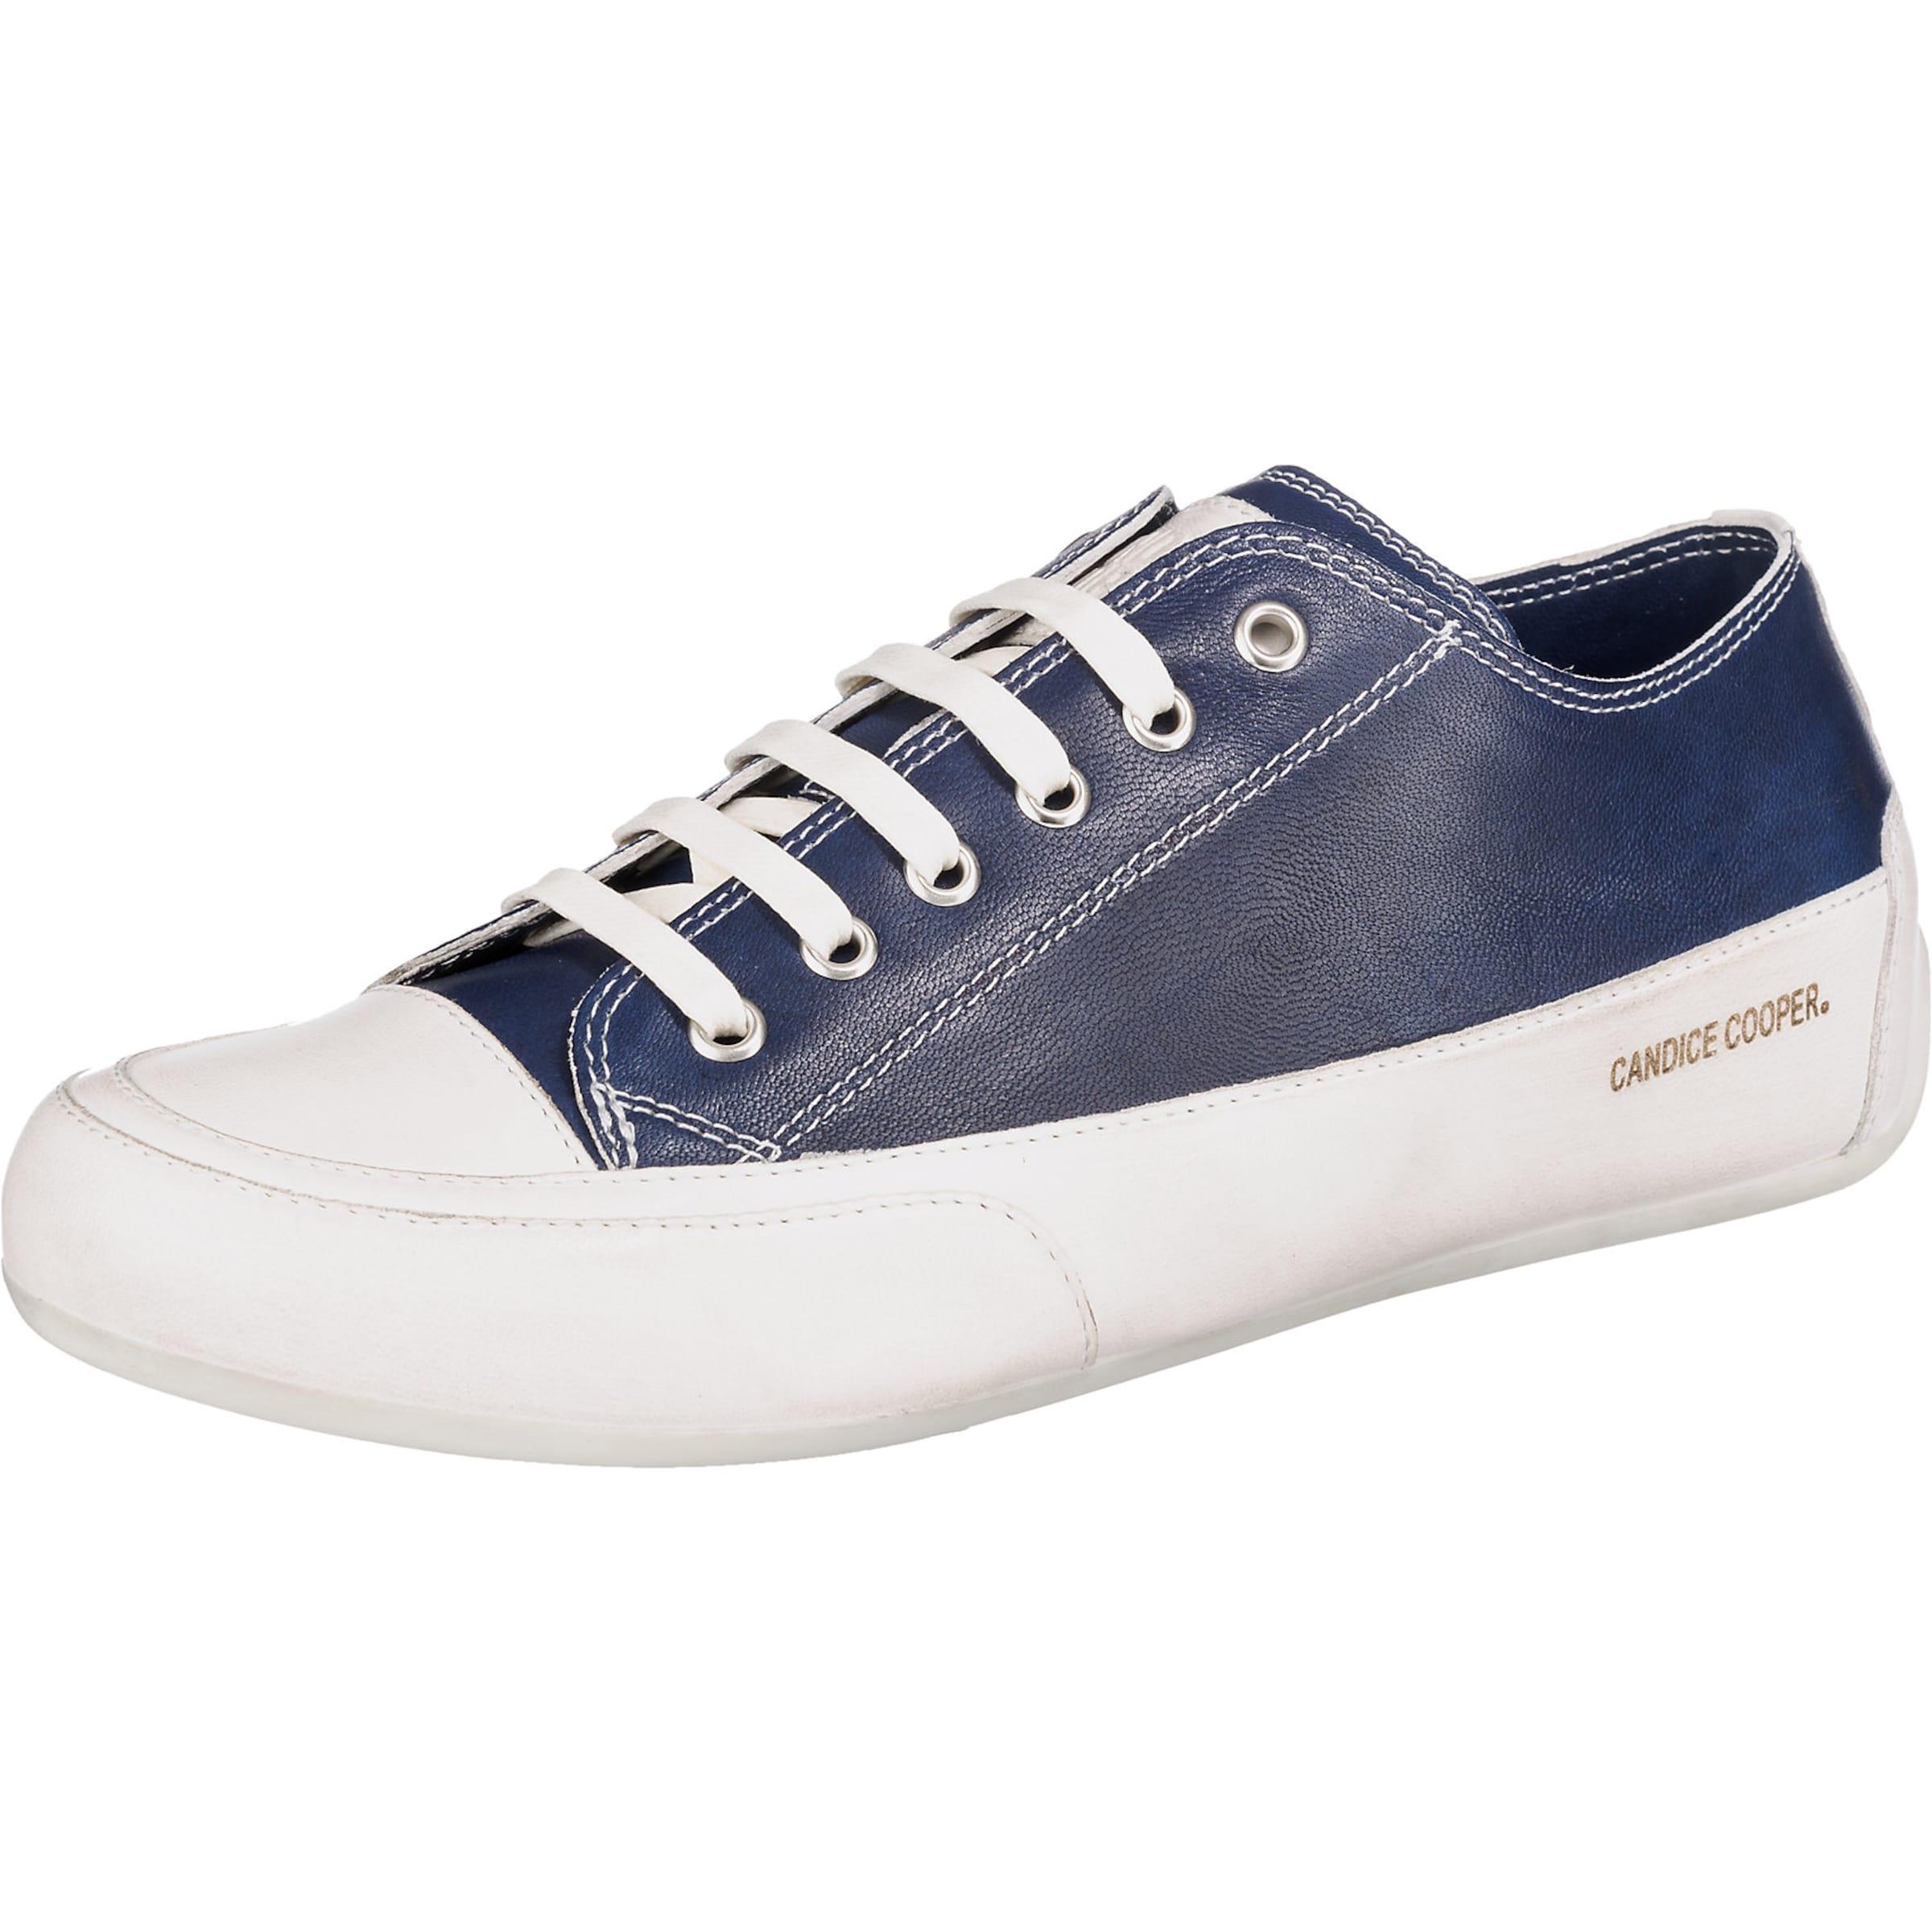 Candice Cooper Turnschuhe Low in nachtblau   weiß